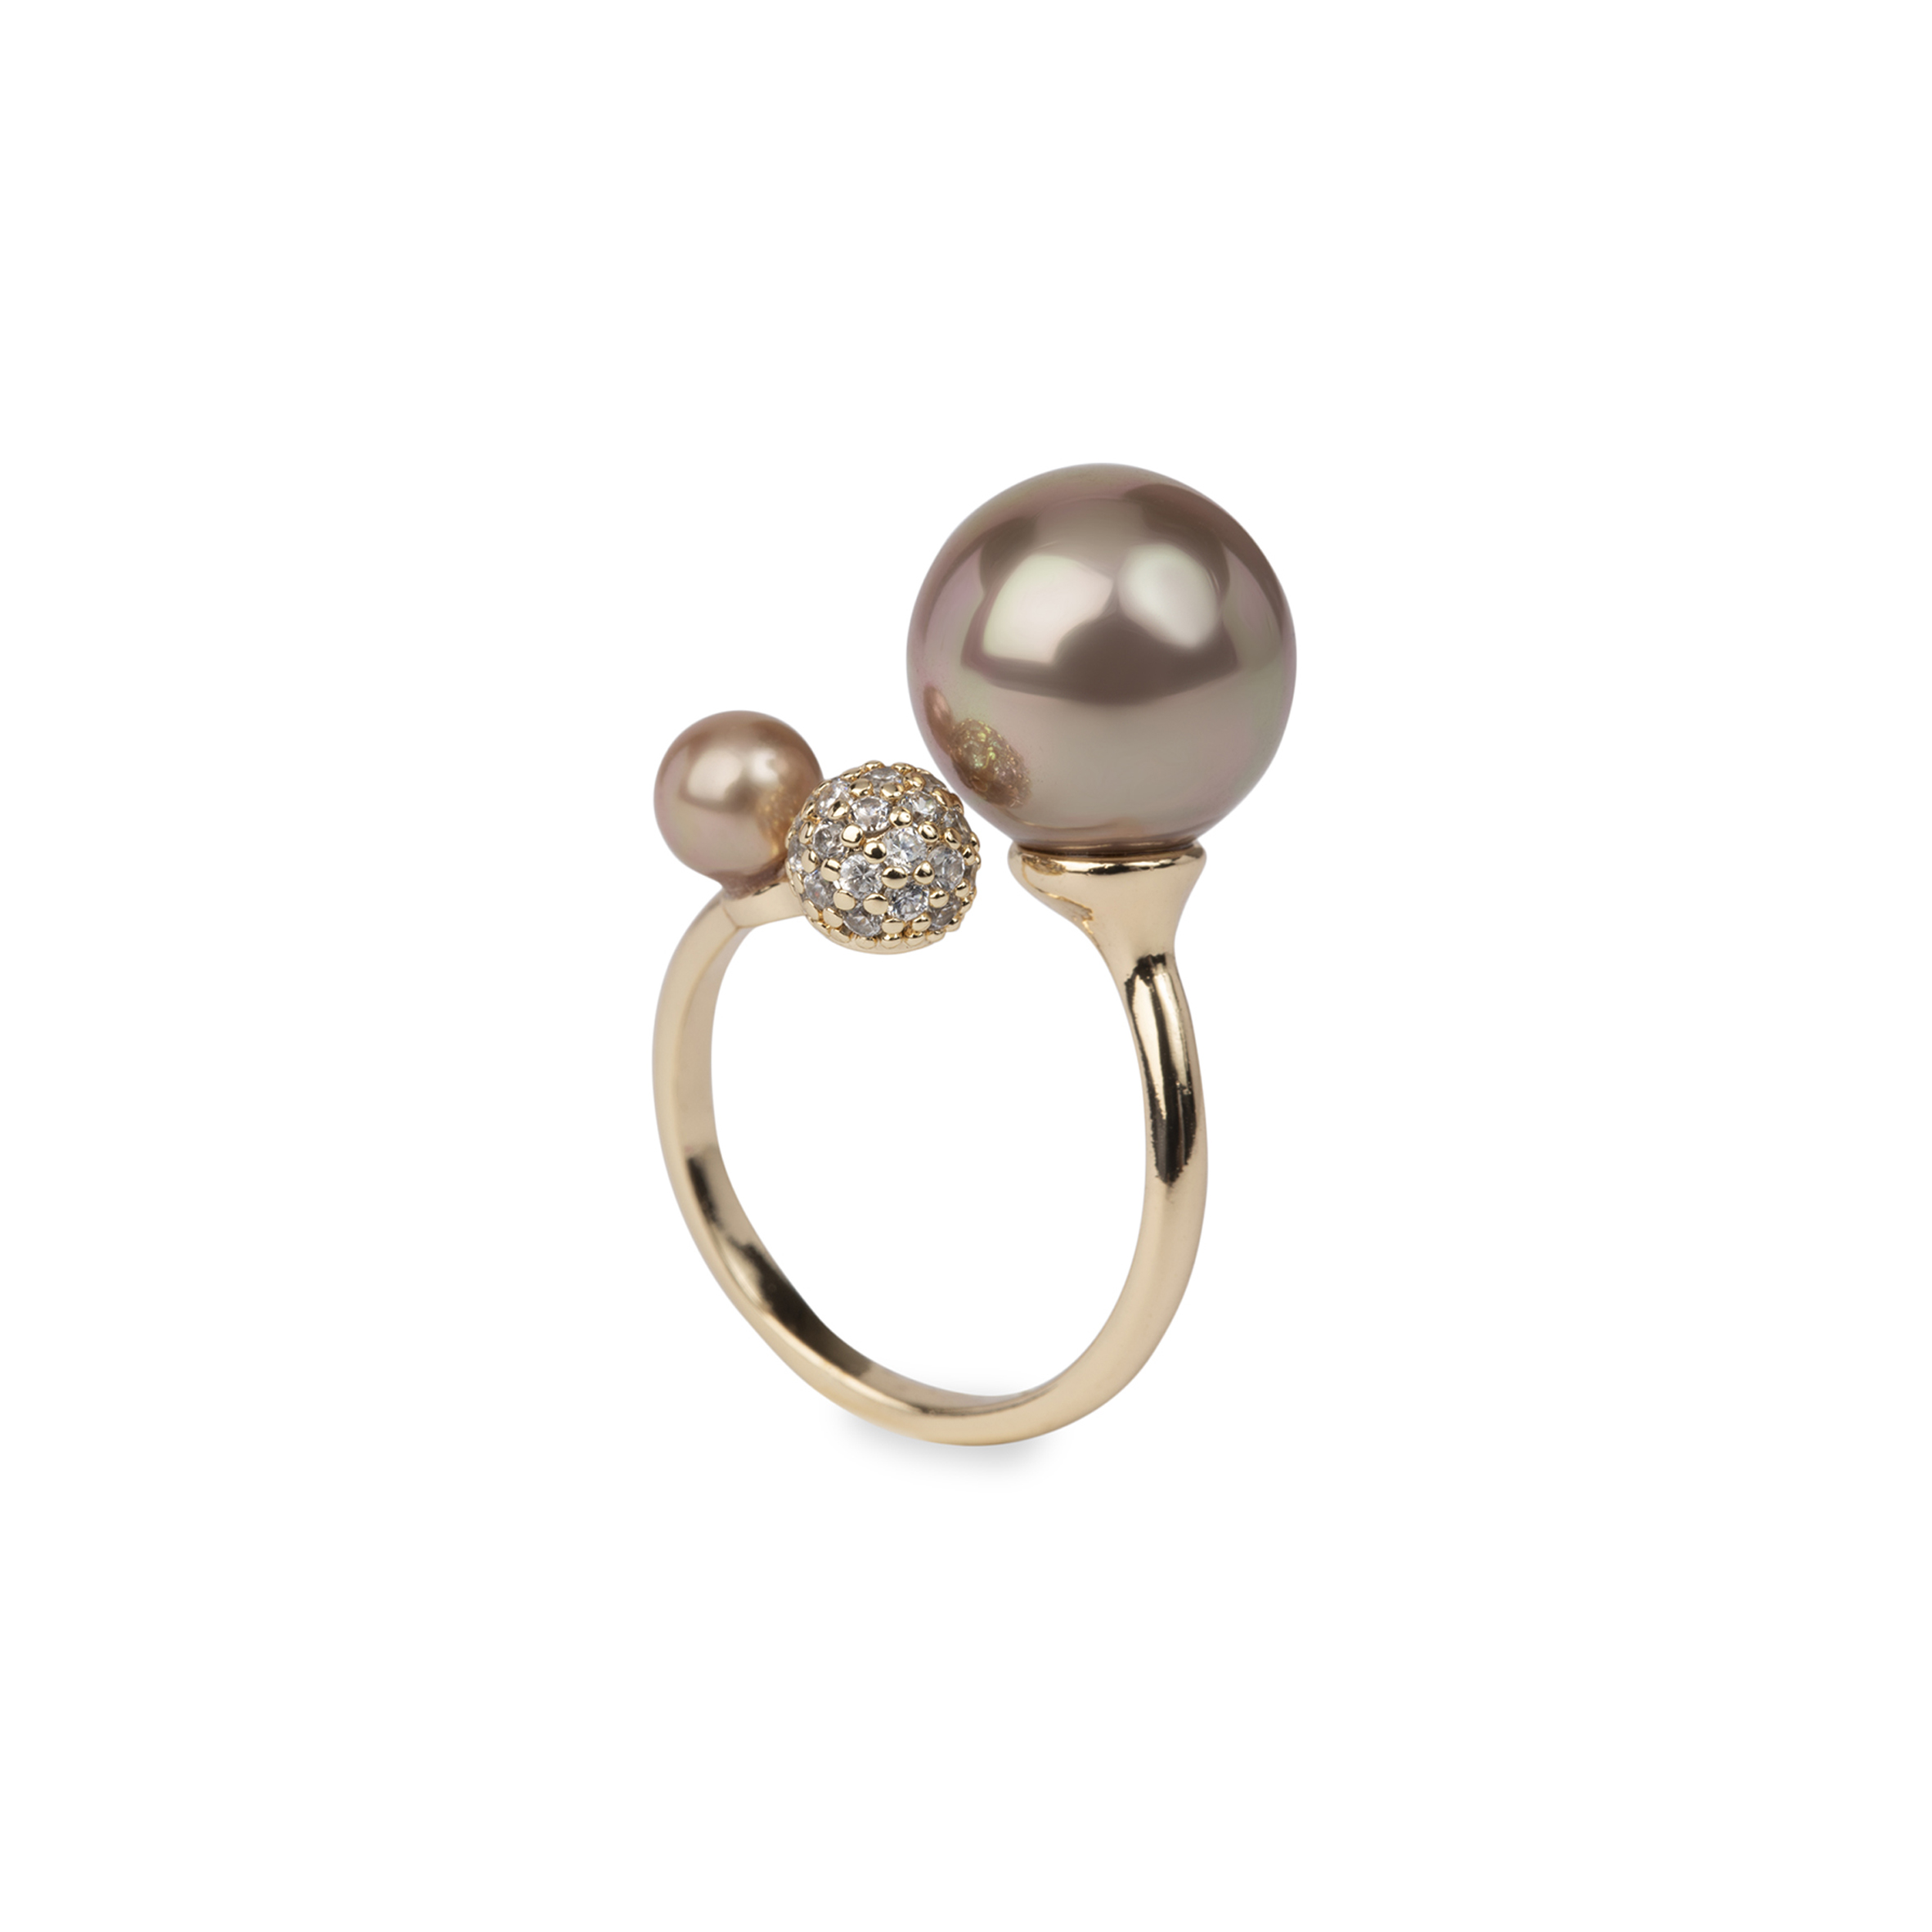 Damsmycke pfg Stockholm Pearls for Girls-Becka Ring - One size 60011-18